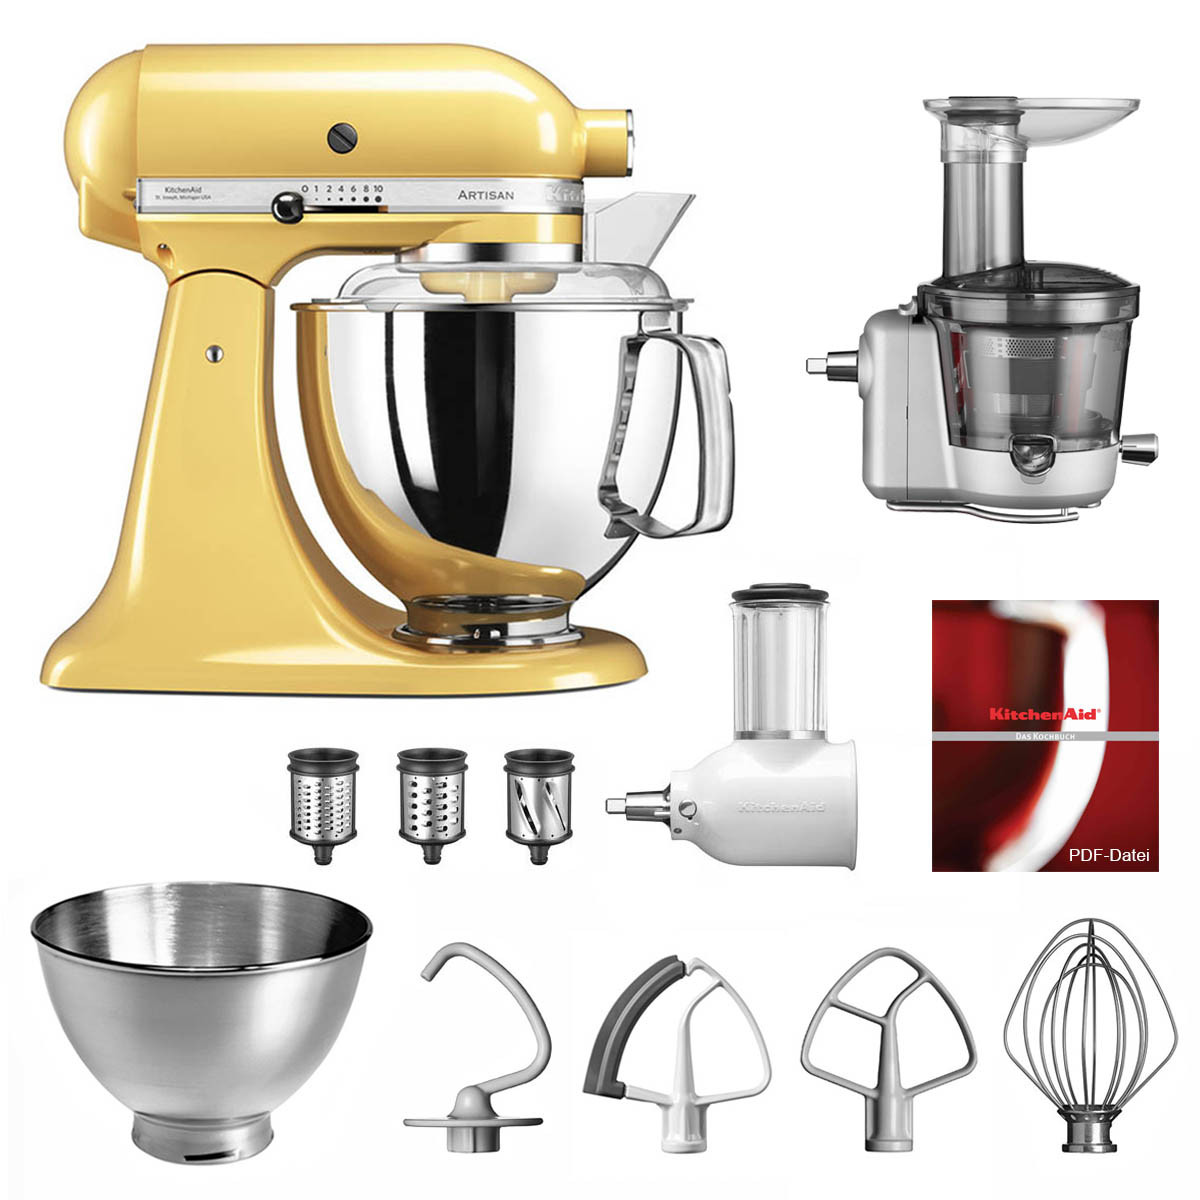 KitchenAid Küchenmaschine 175PS Entsafter Vital-Set pastellgelb